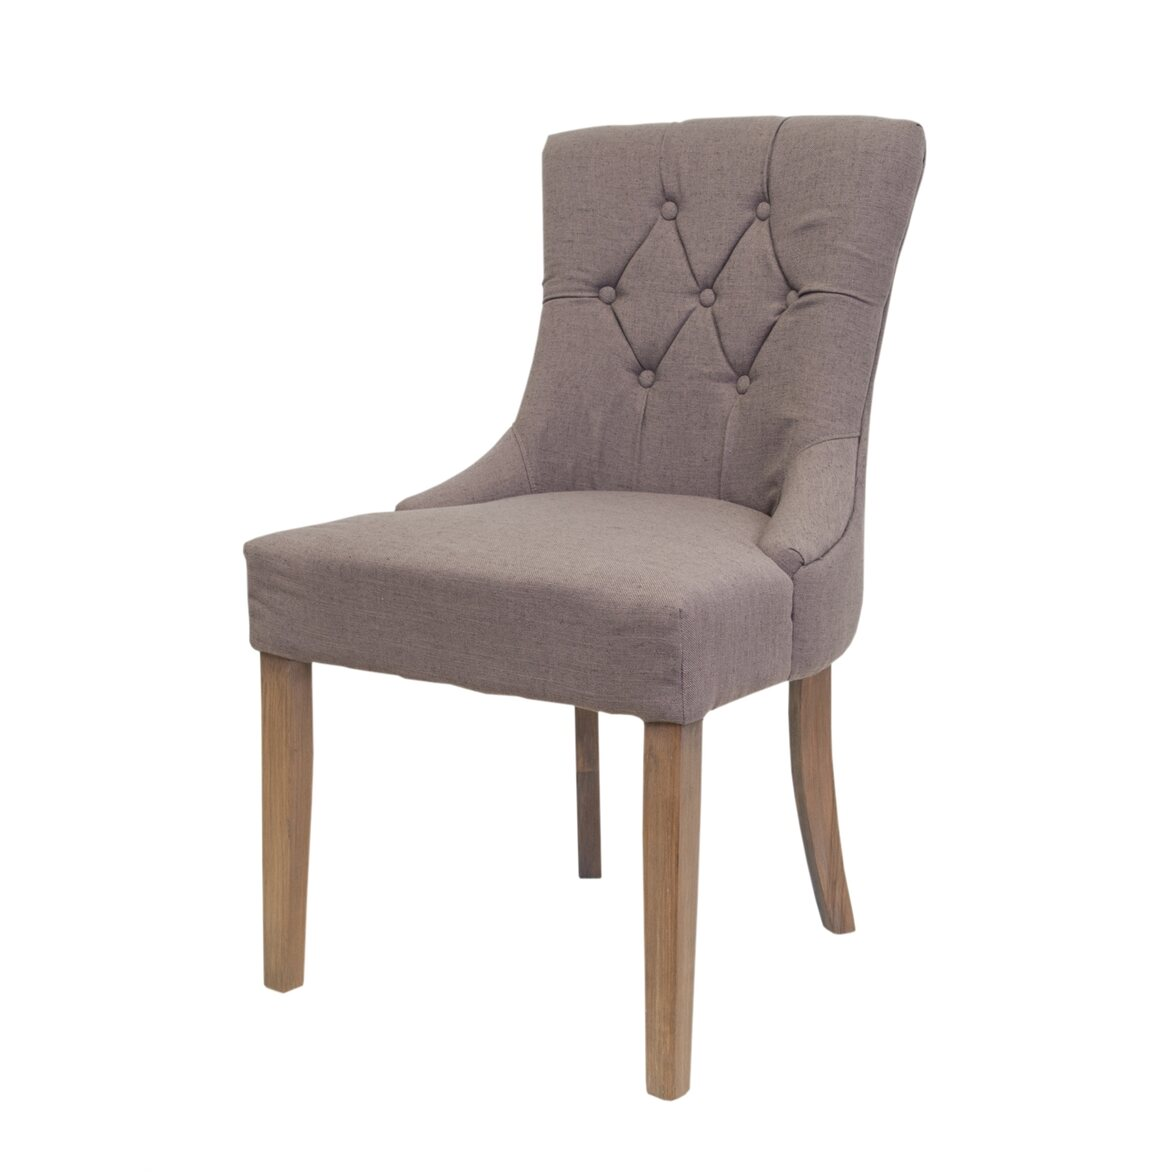 Стул Avec 4 | Обеденные стулья Kingsby